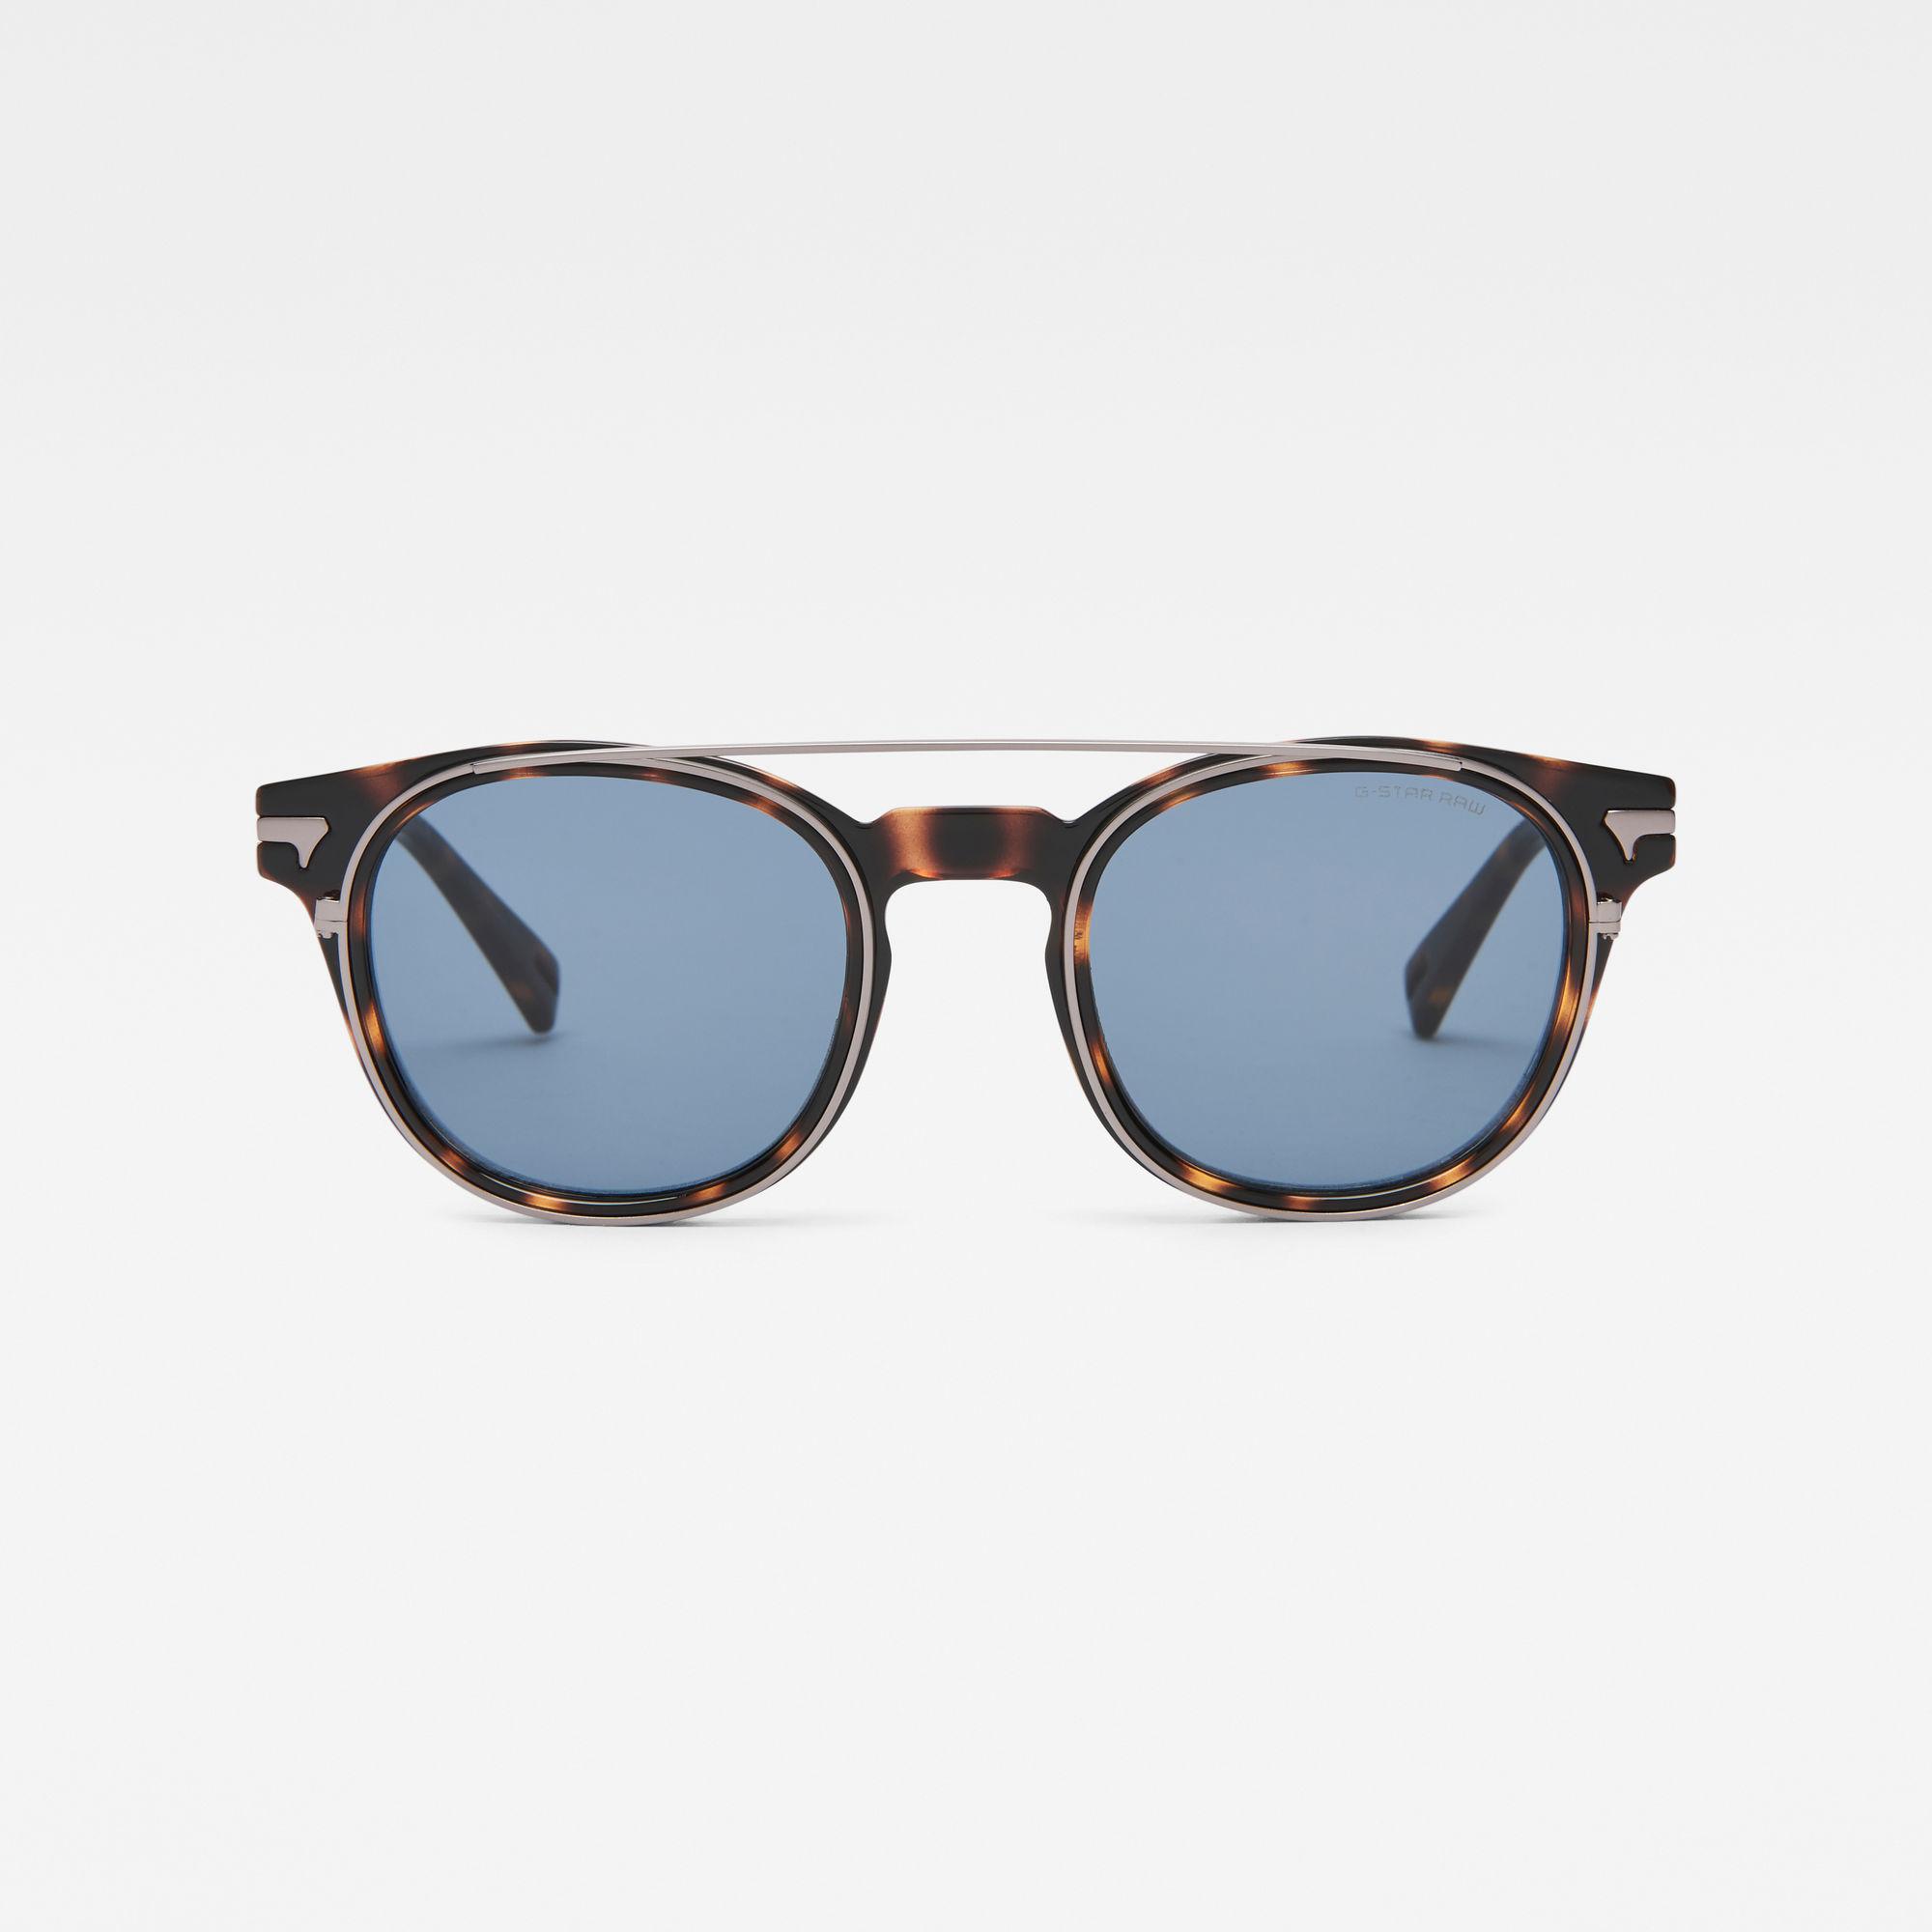 Image of G Star Raw Combo Pruxon Sunglasses